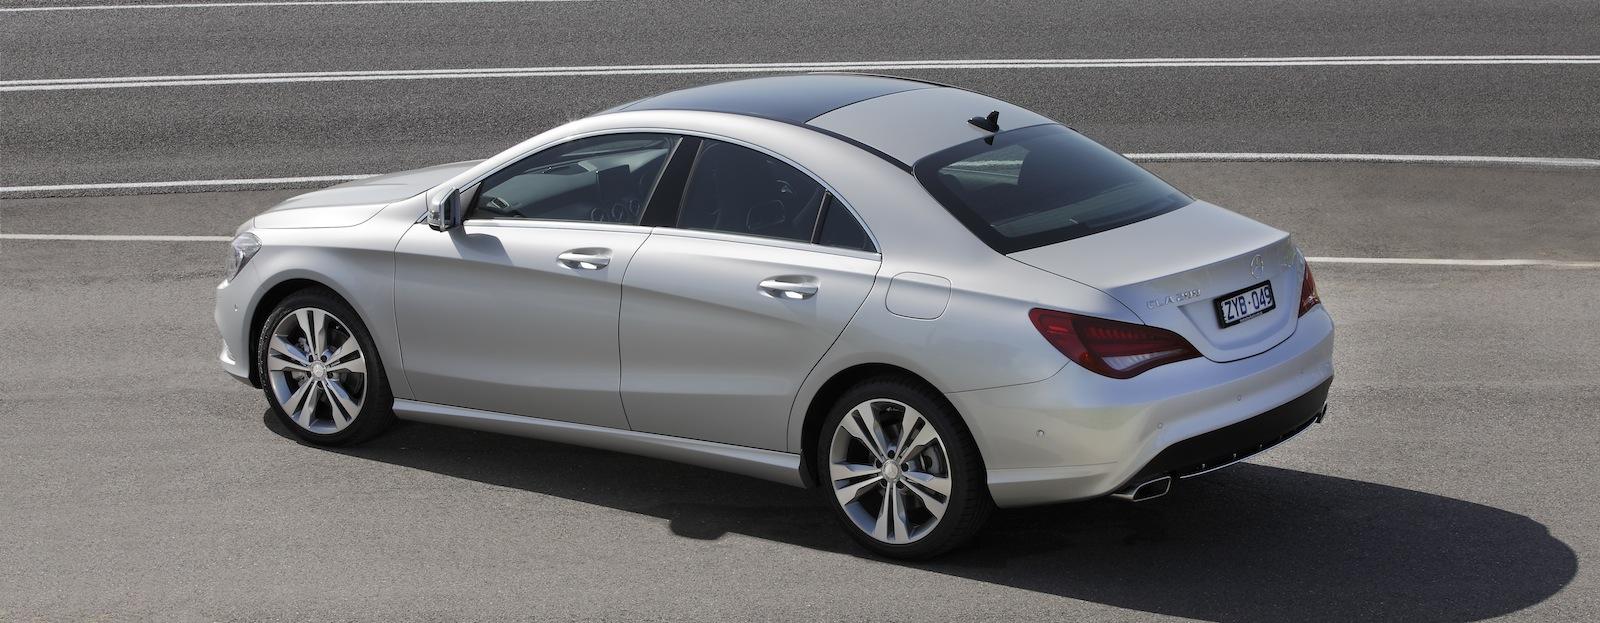 Mercedes benz cla class review cla200 caradvice for 2013 mercedes benz cla class